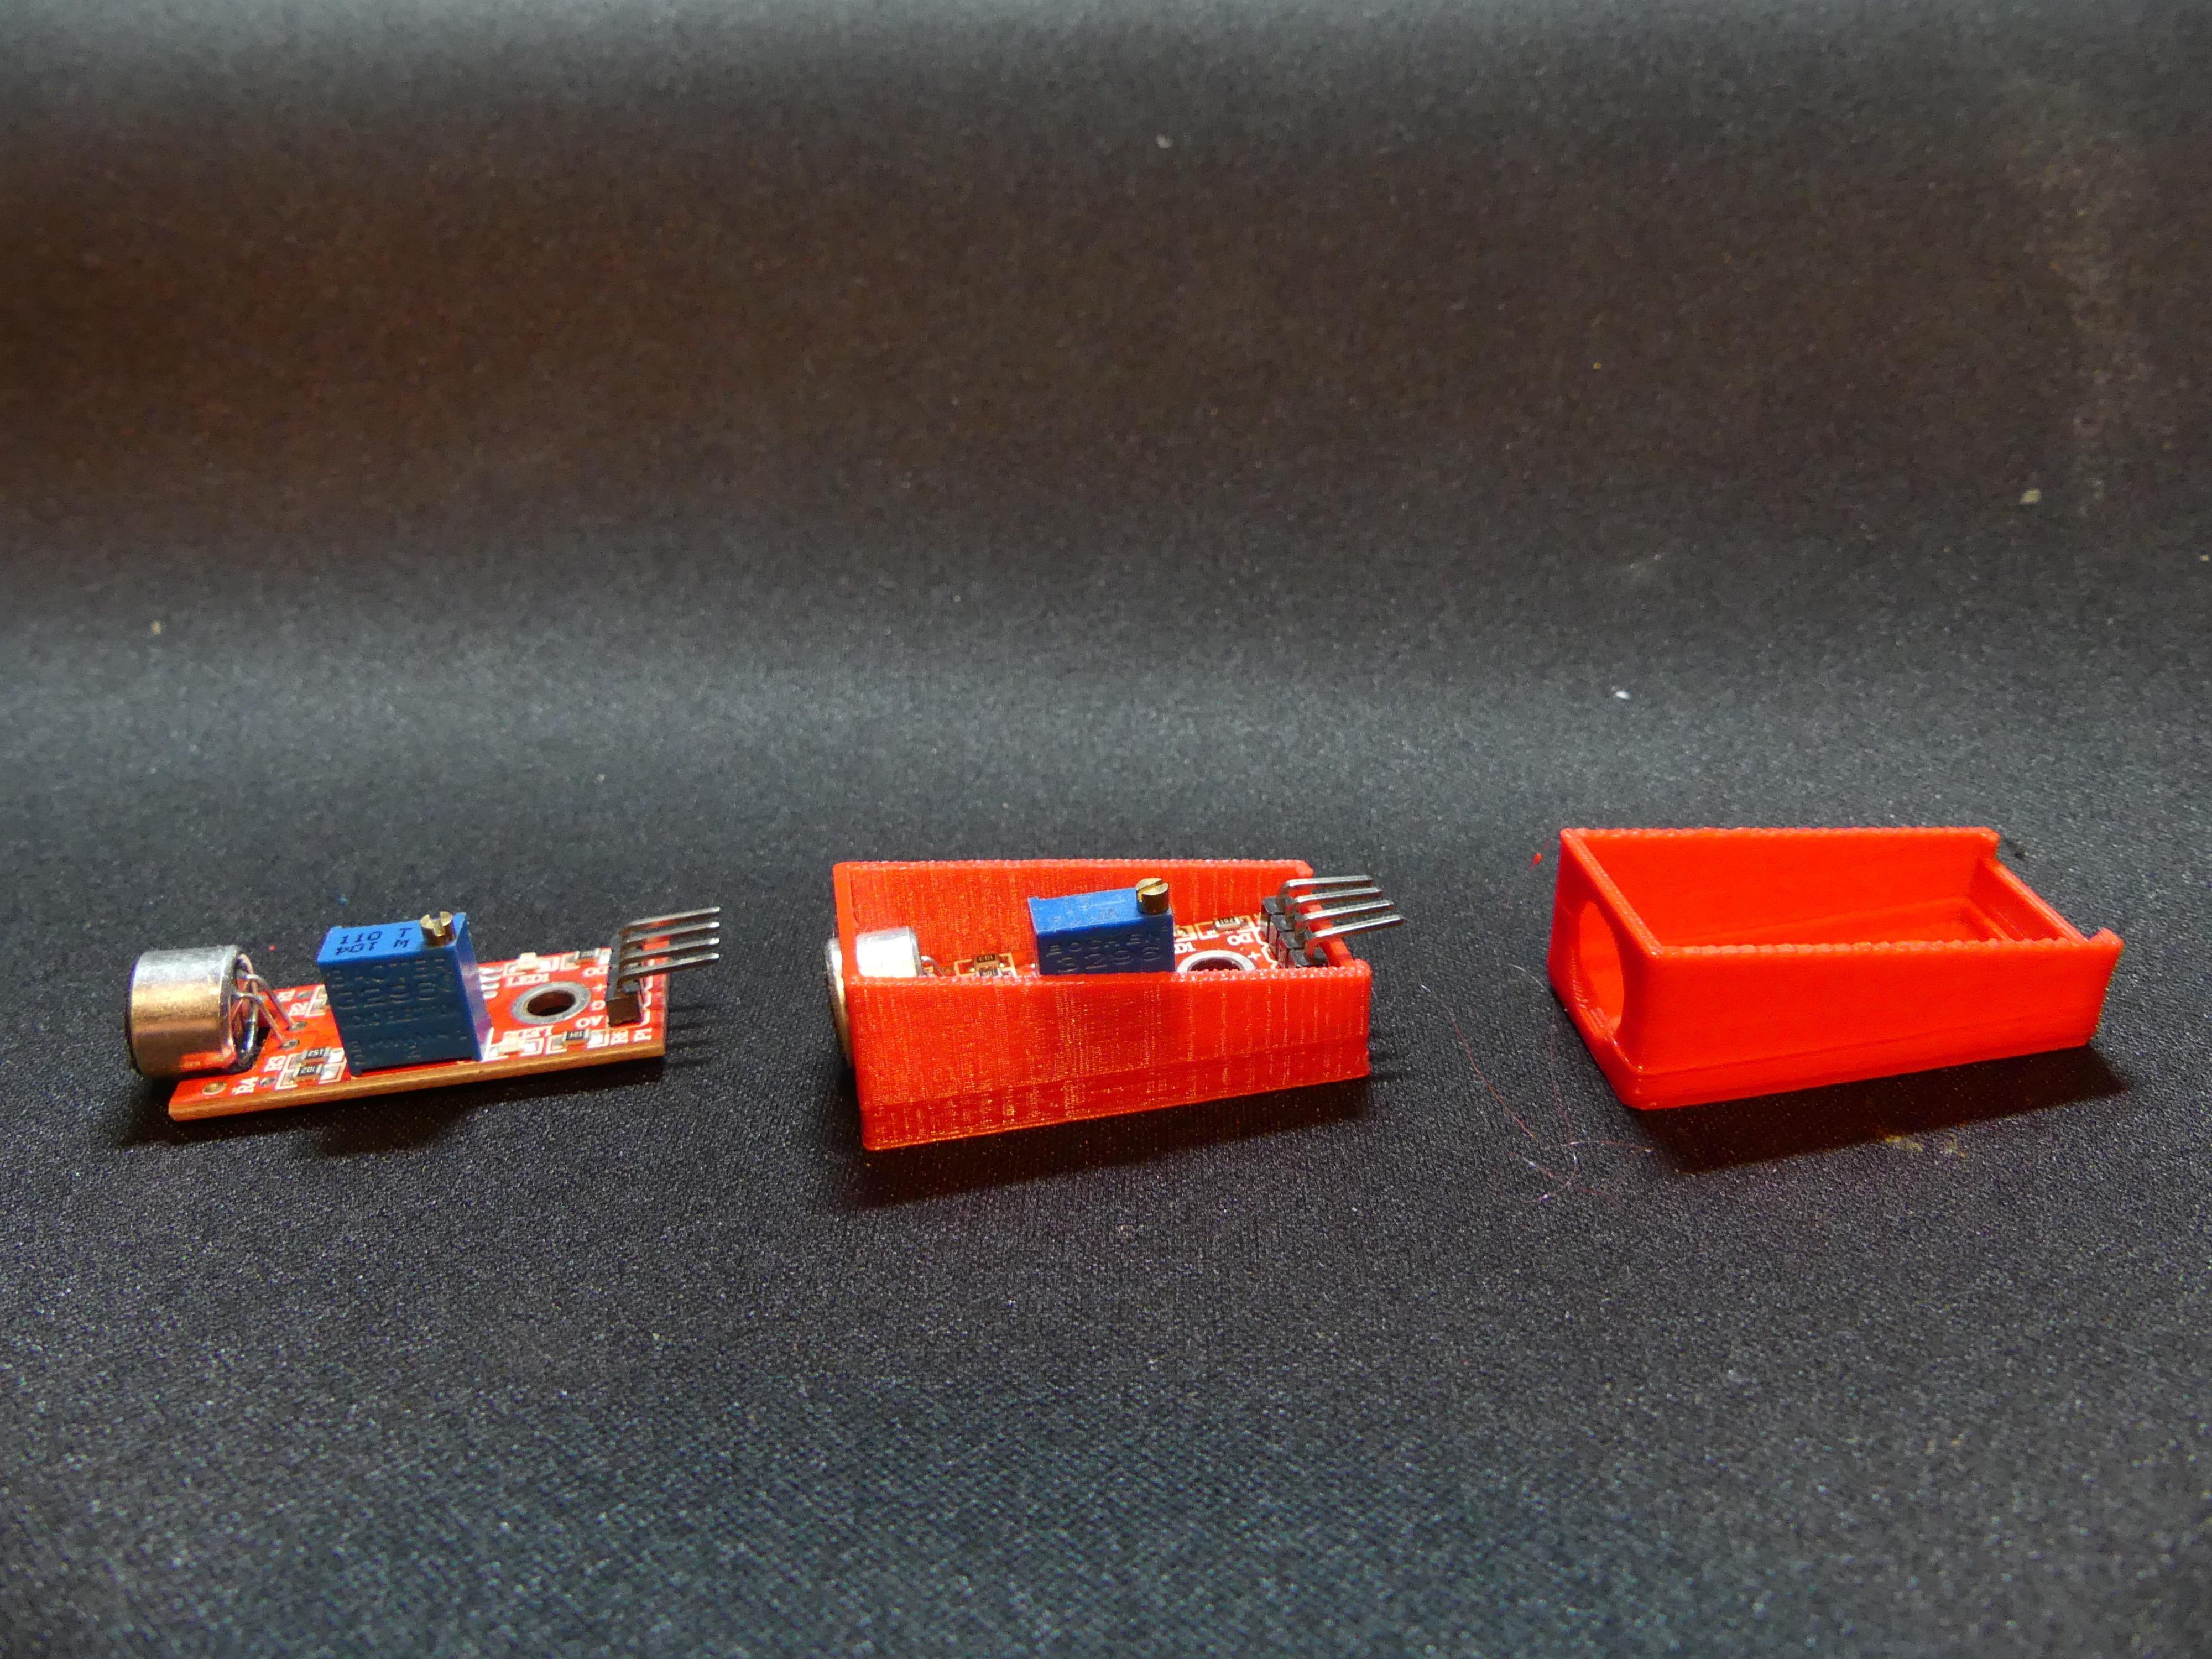 P1140353.JPG Download free STL file Arduino Sound Sensor Bracket • 3D printable template, Linventif